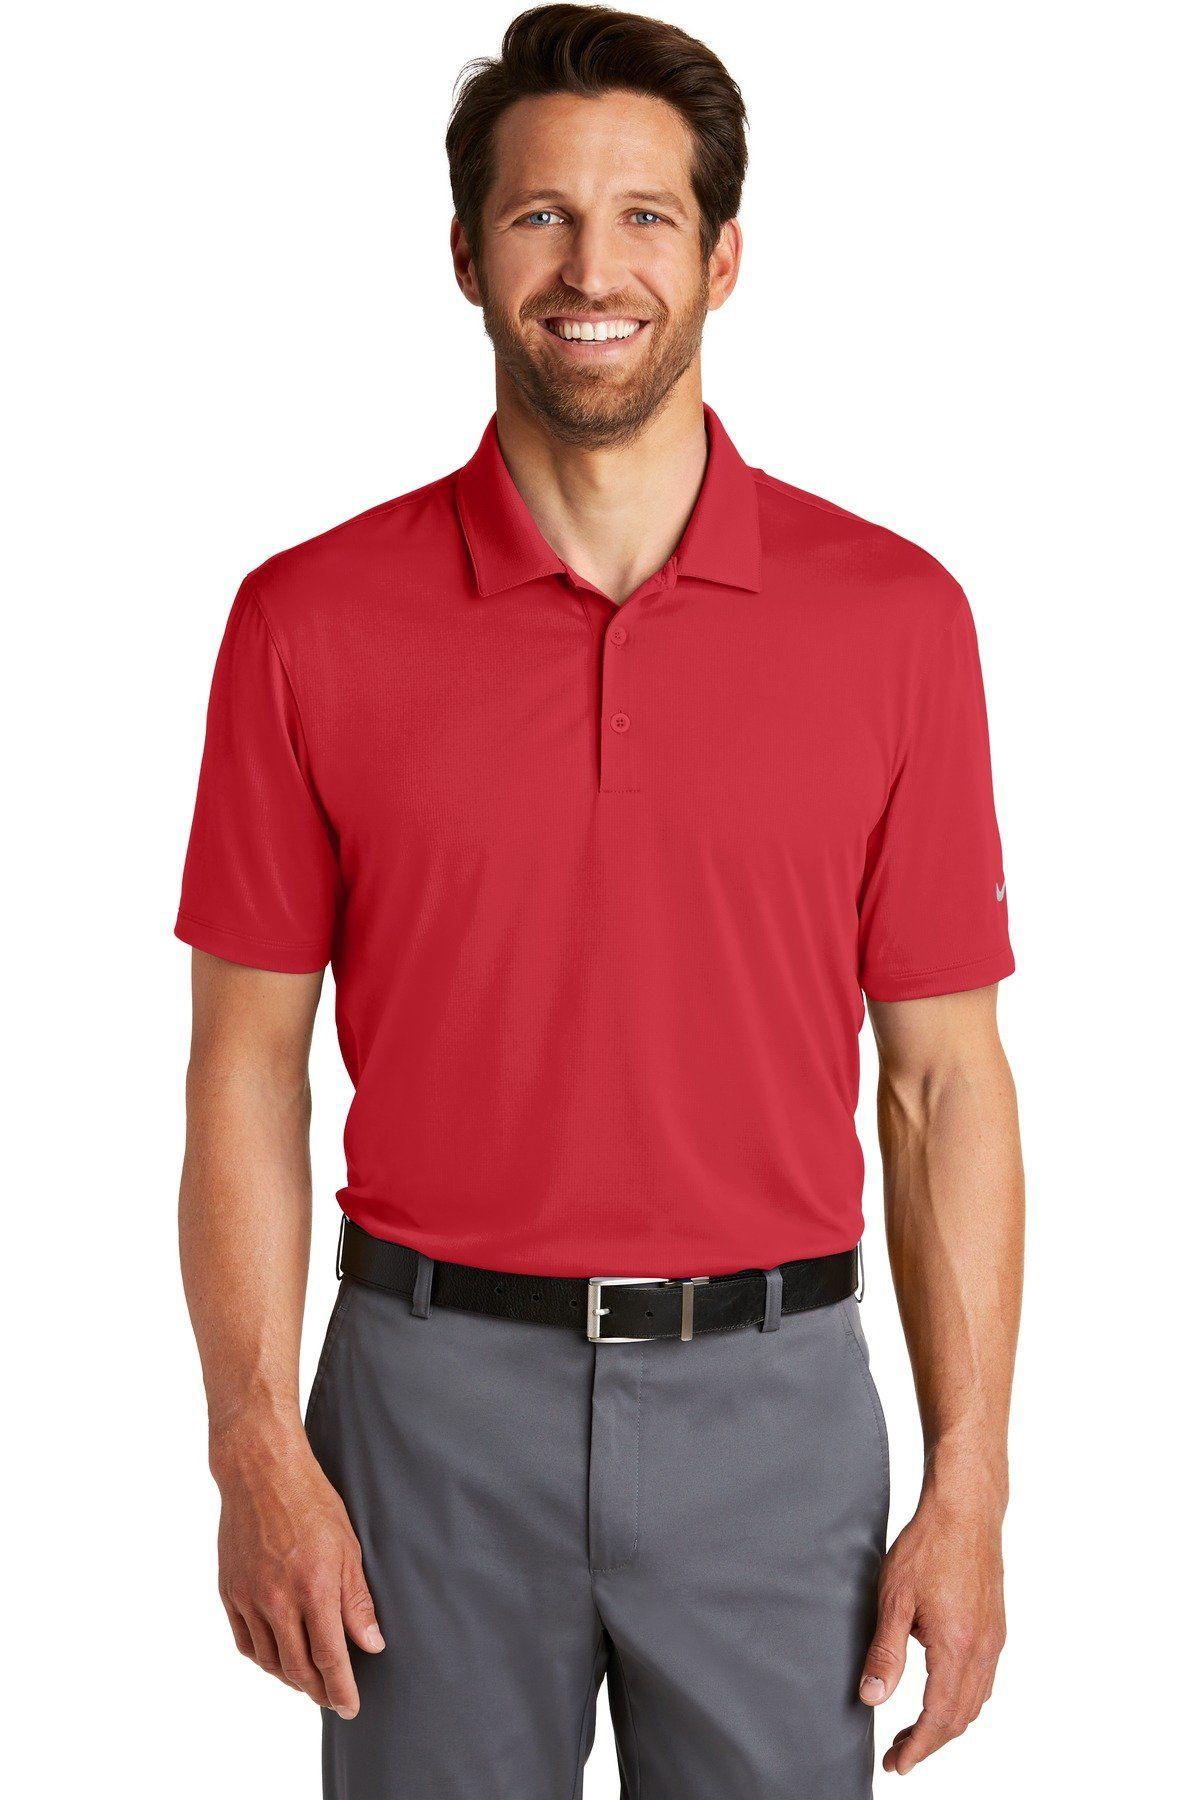 Custom Nike Dri Fit Golf Shirts Lauren Goss